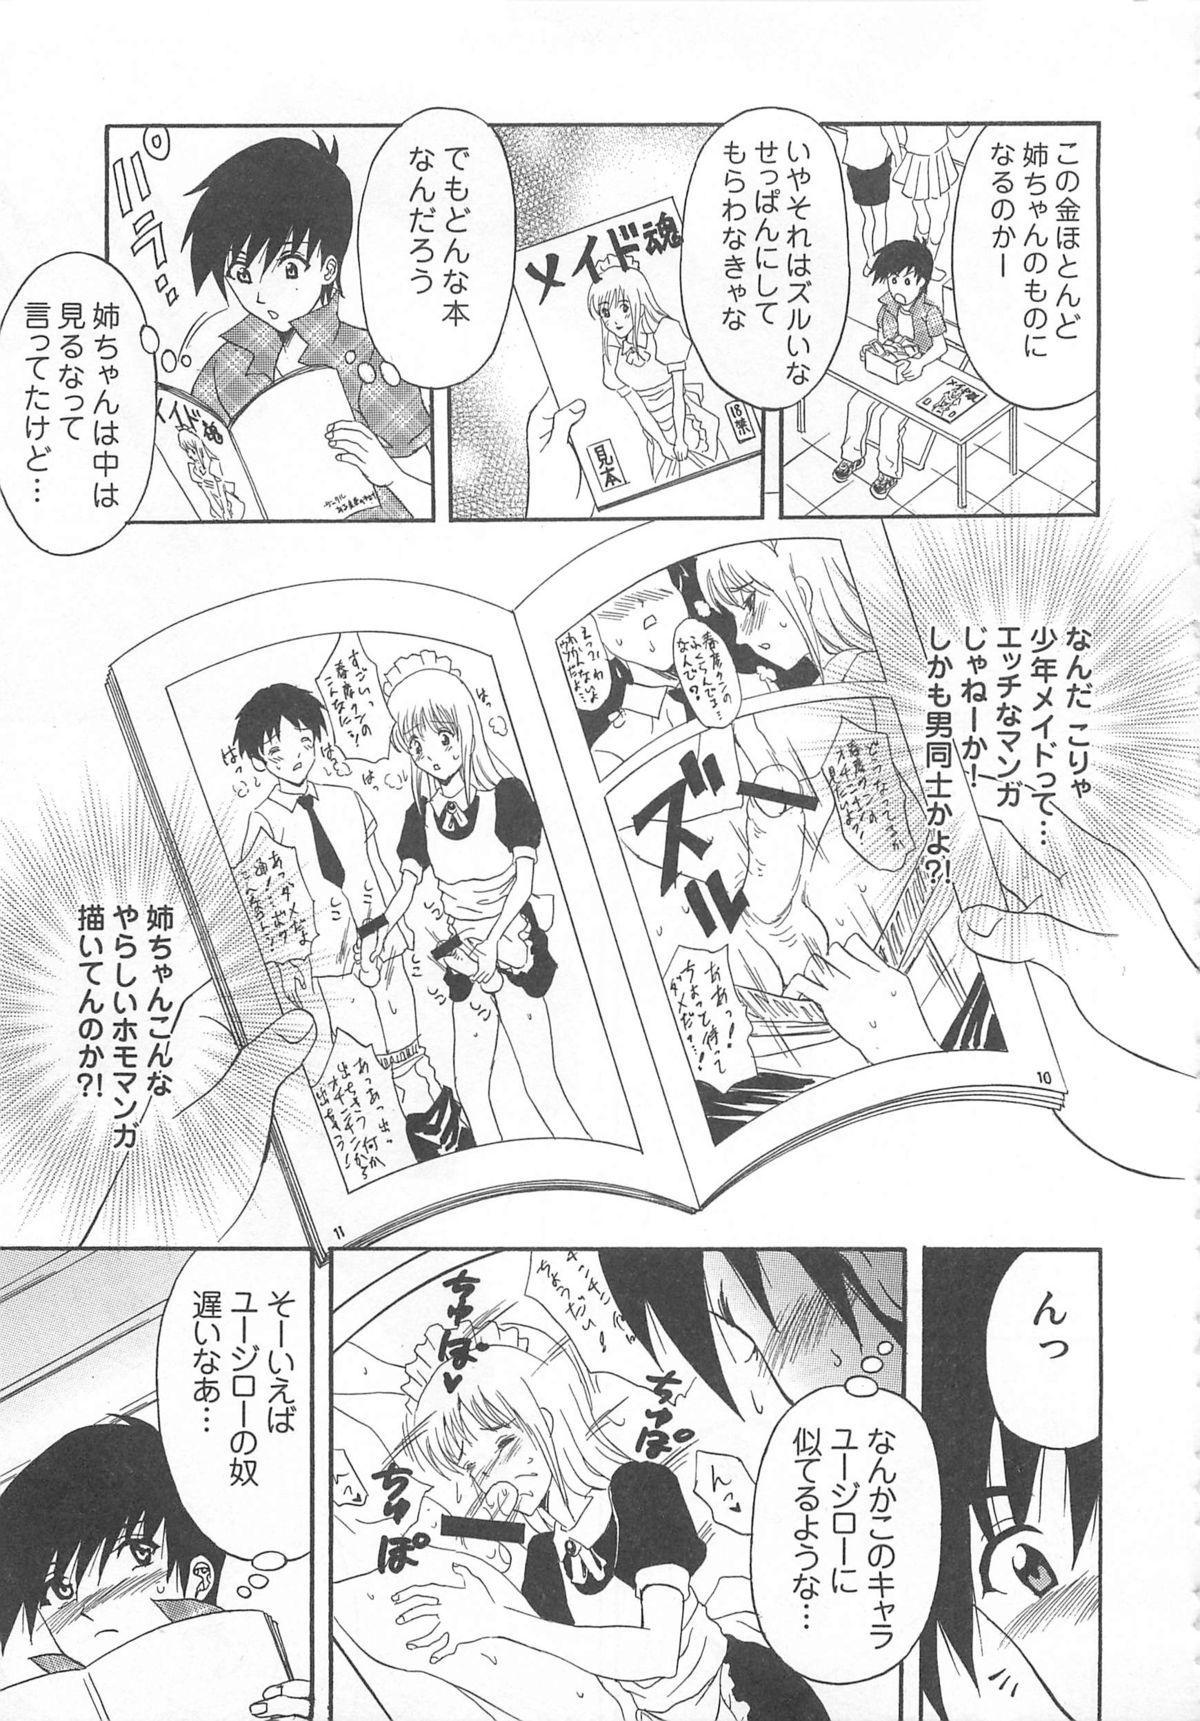 Otokonoko HEAVEN Vol. 02 Dokidoki Chikan Taiken 75